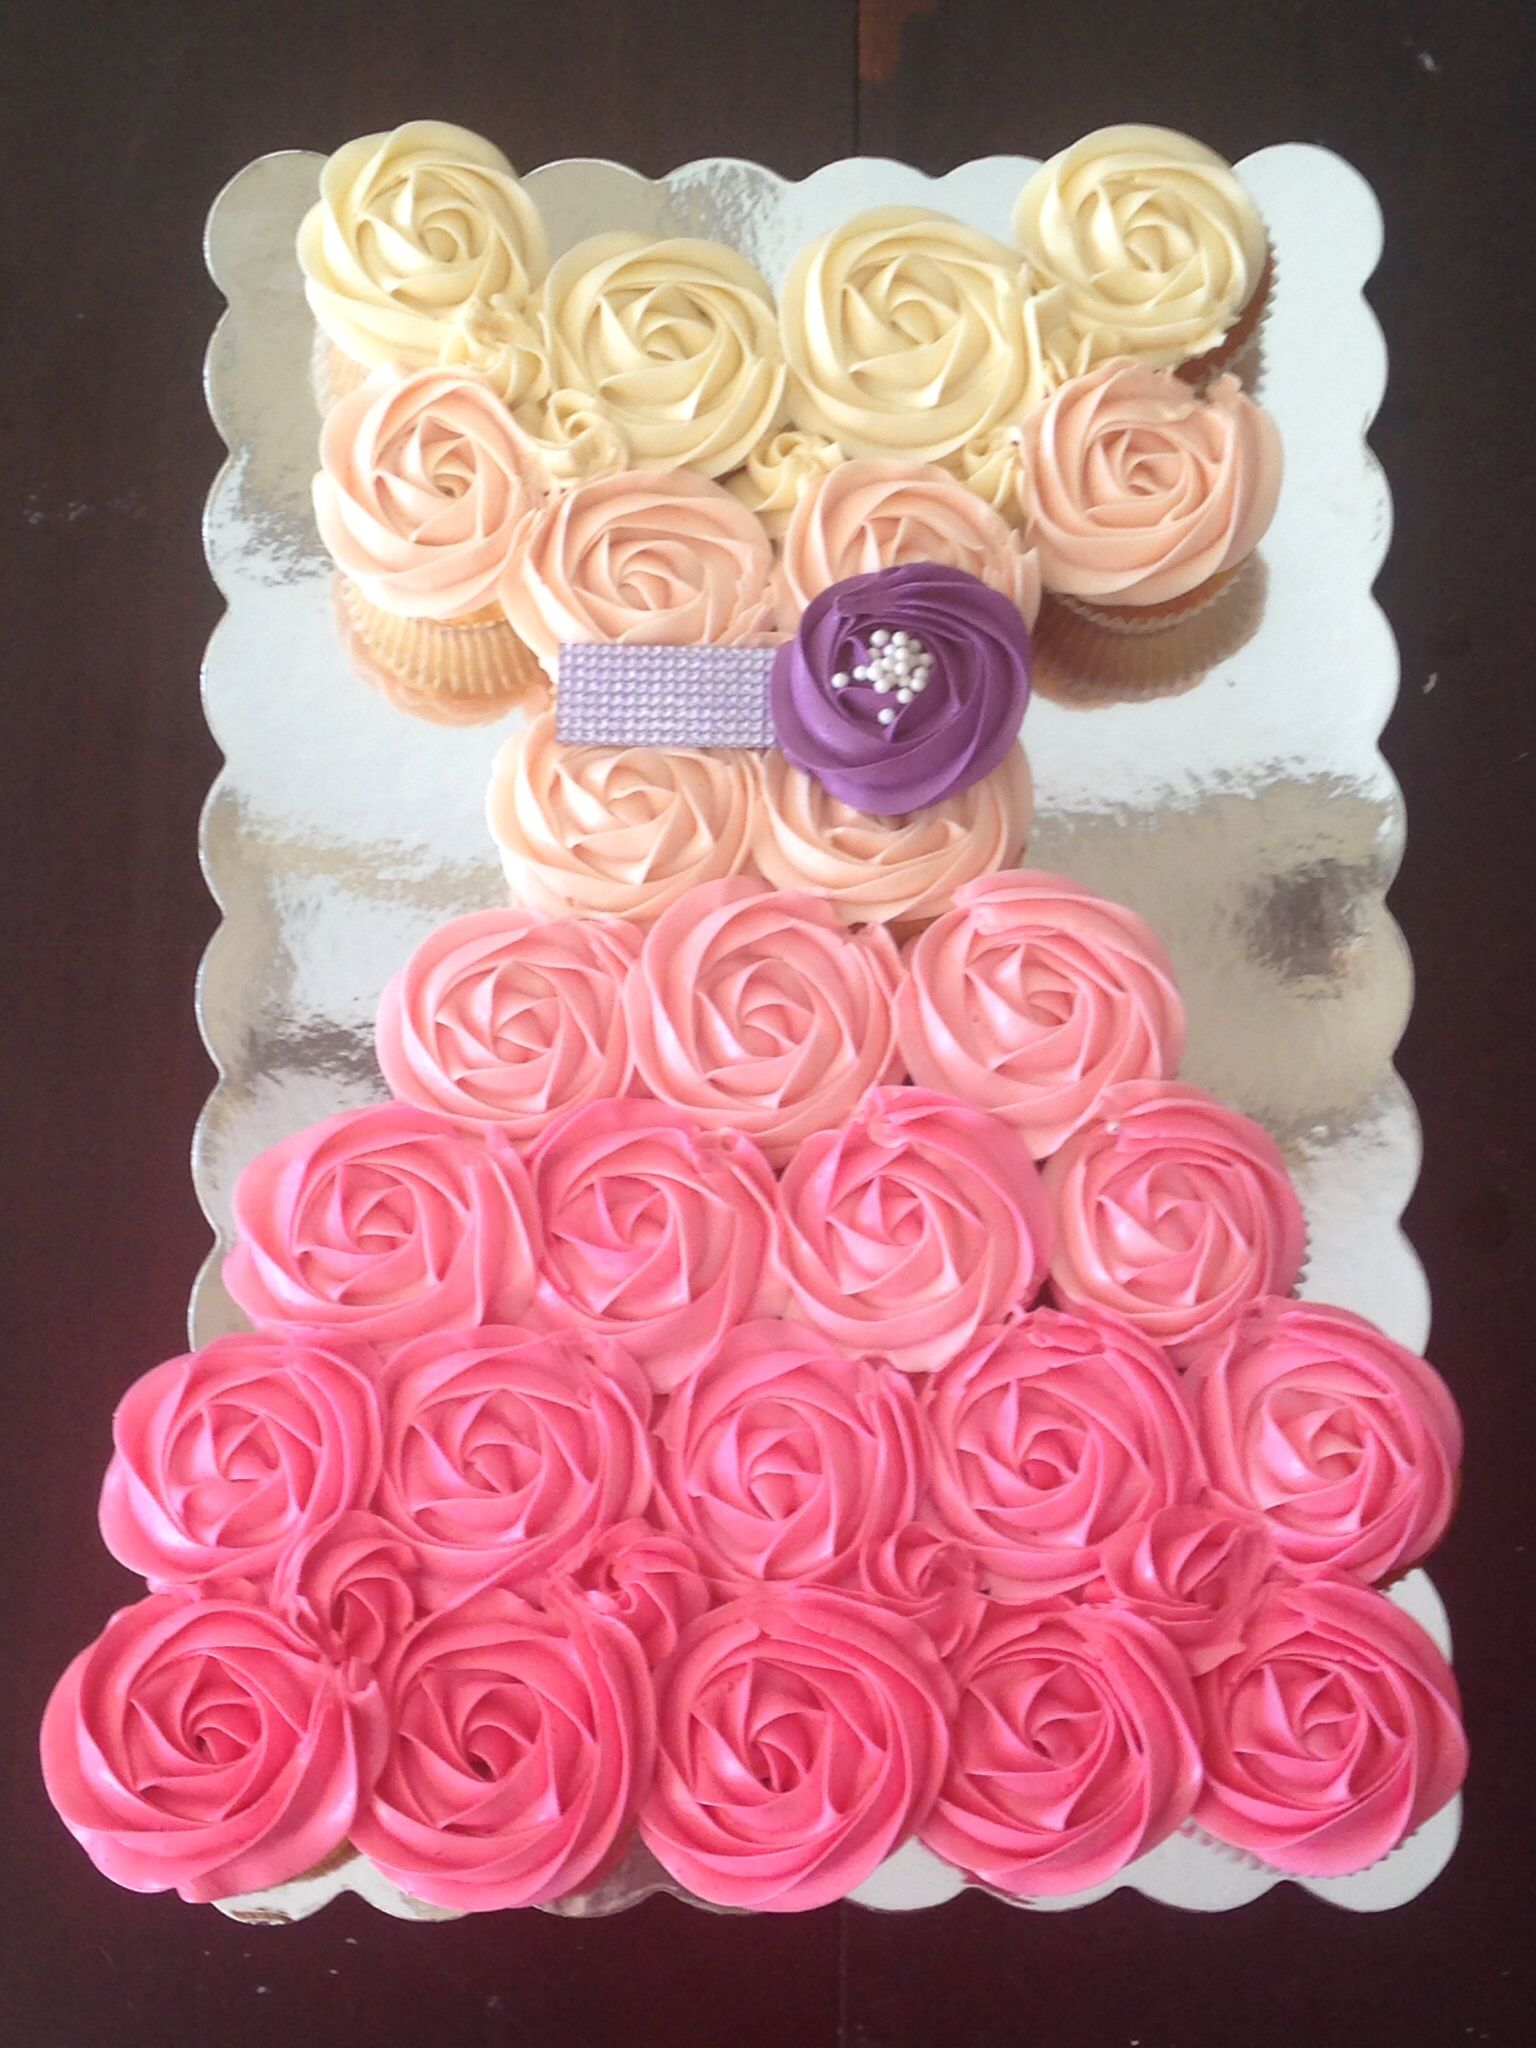 Ombre Cupcake Dress Cake | Calgary, family friendly | Pinterest ...